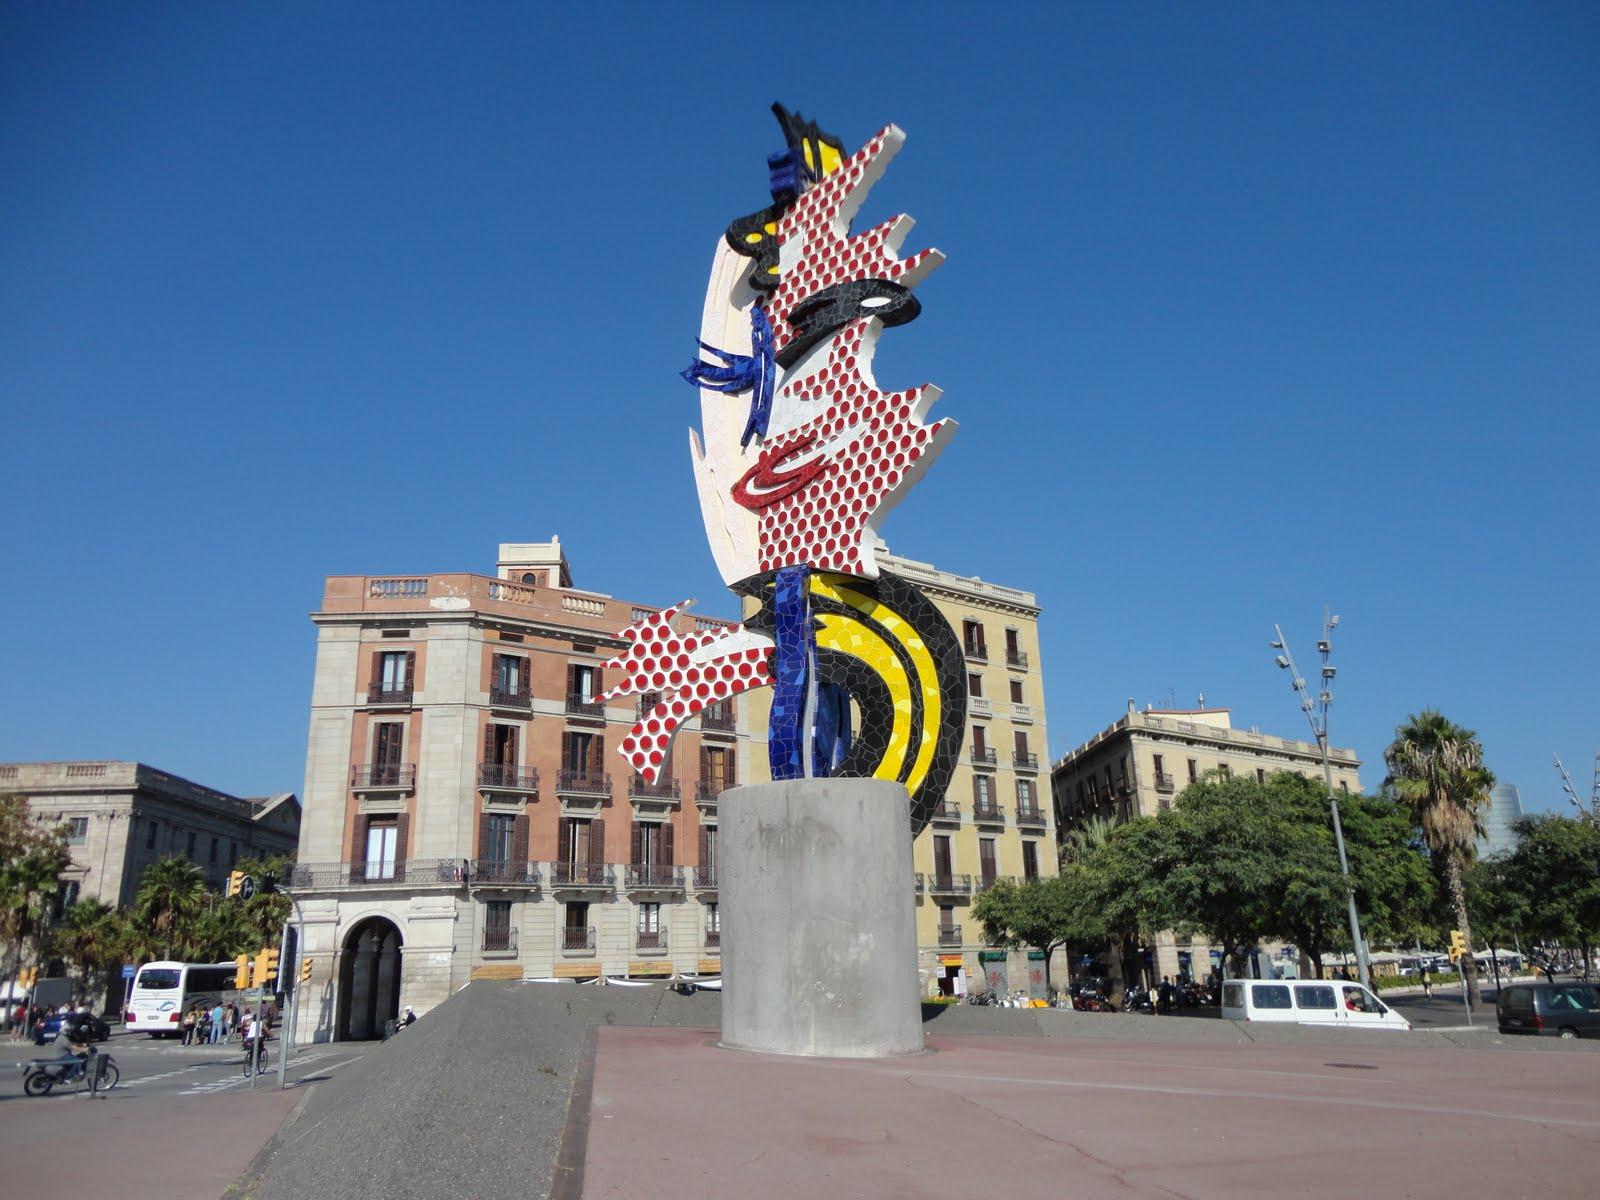 Barcelona parte iii do port vell ao port ol mpic for Aigues de barcelona oficina